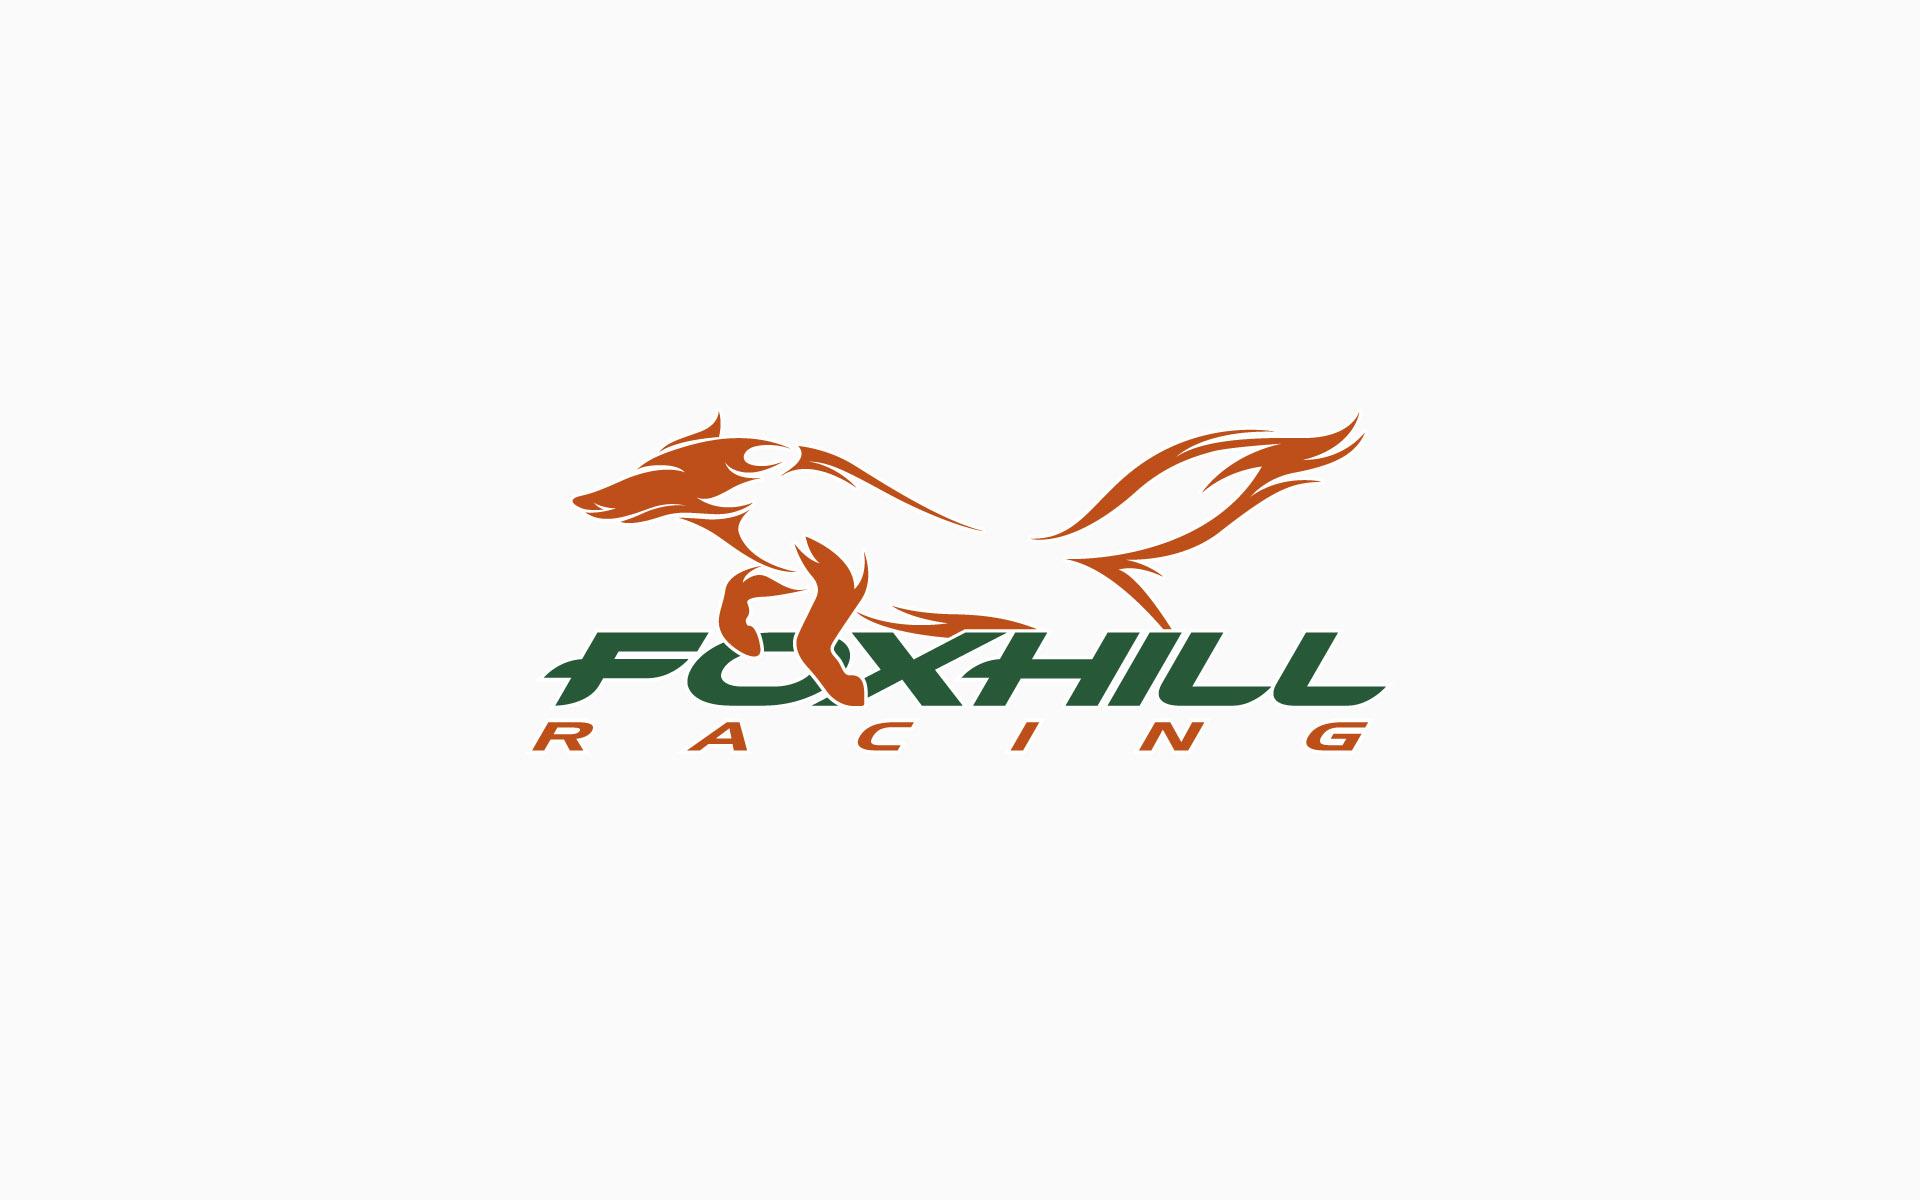 Foxhill Racing Brand Identity